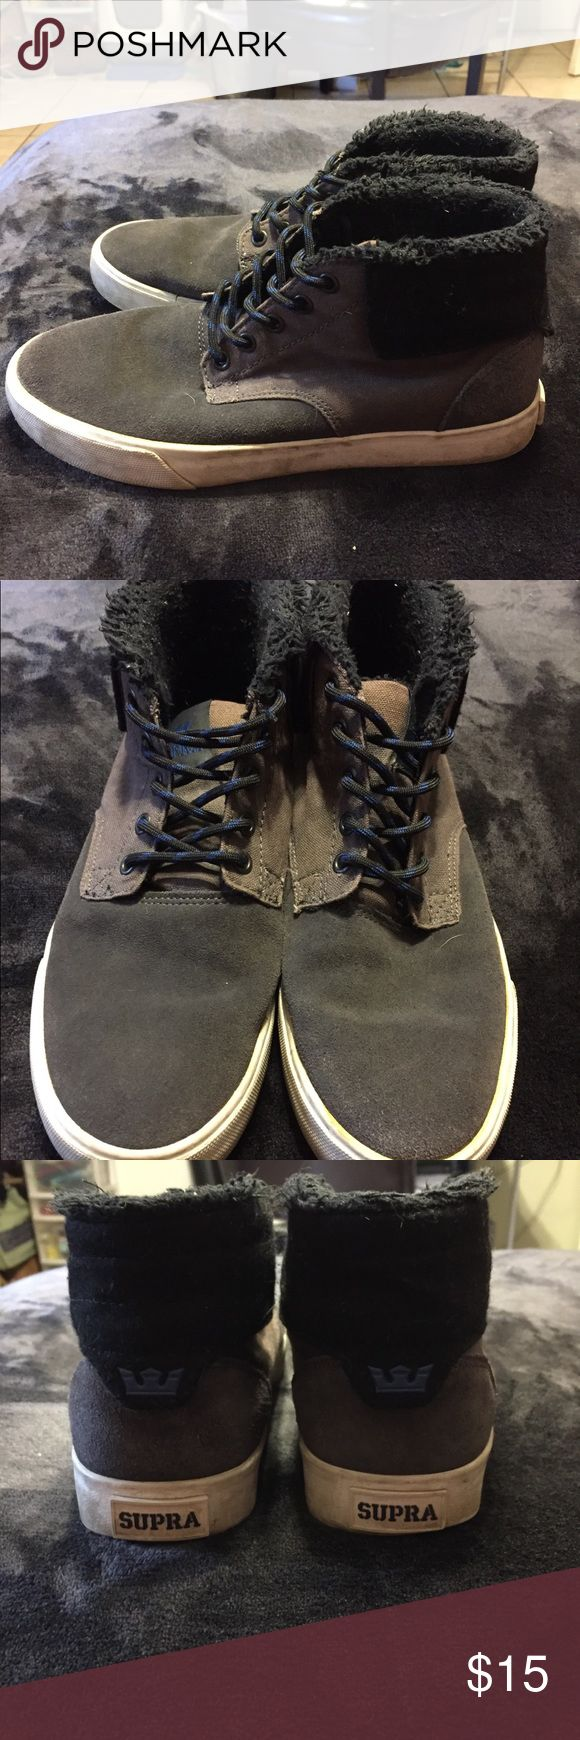 Men's Supra sneakers in size 7.5 Men's Supra sneakers in size 7.5 Supra Shoes Sneakers